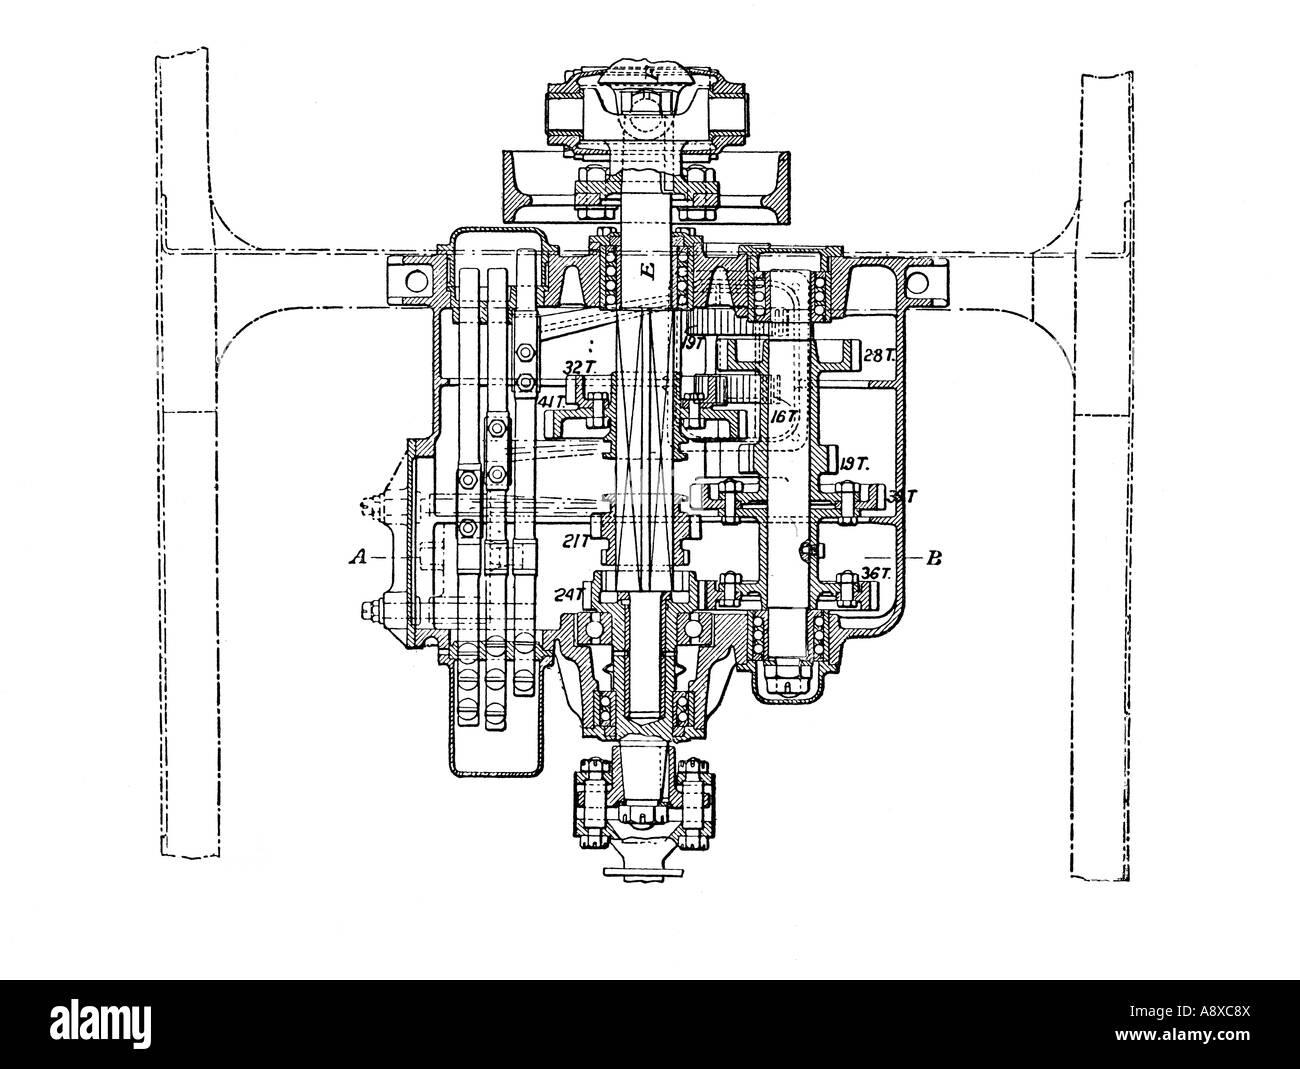 Gearbox Illustration Stockfotos & Gearbox Illustration Bilder - Alamy